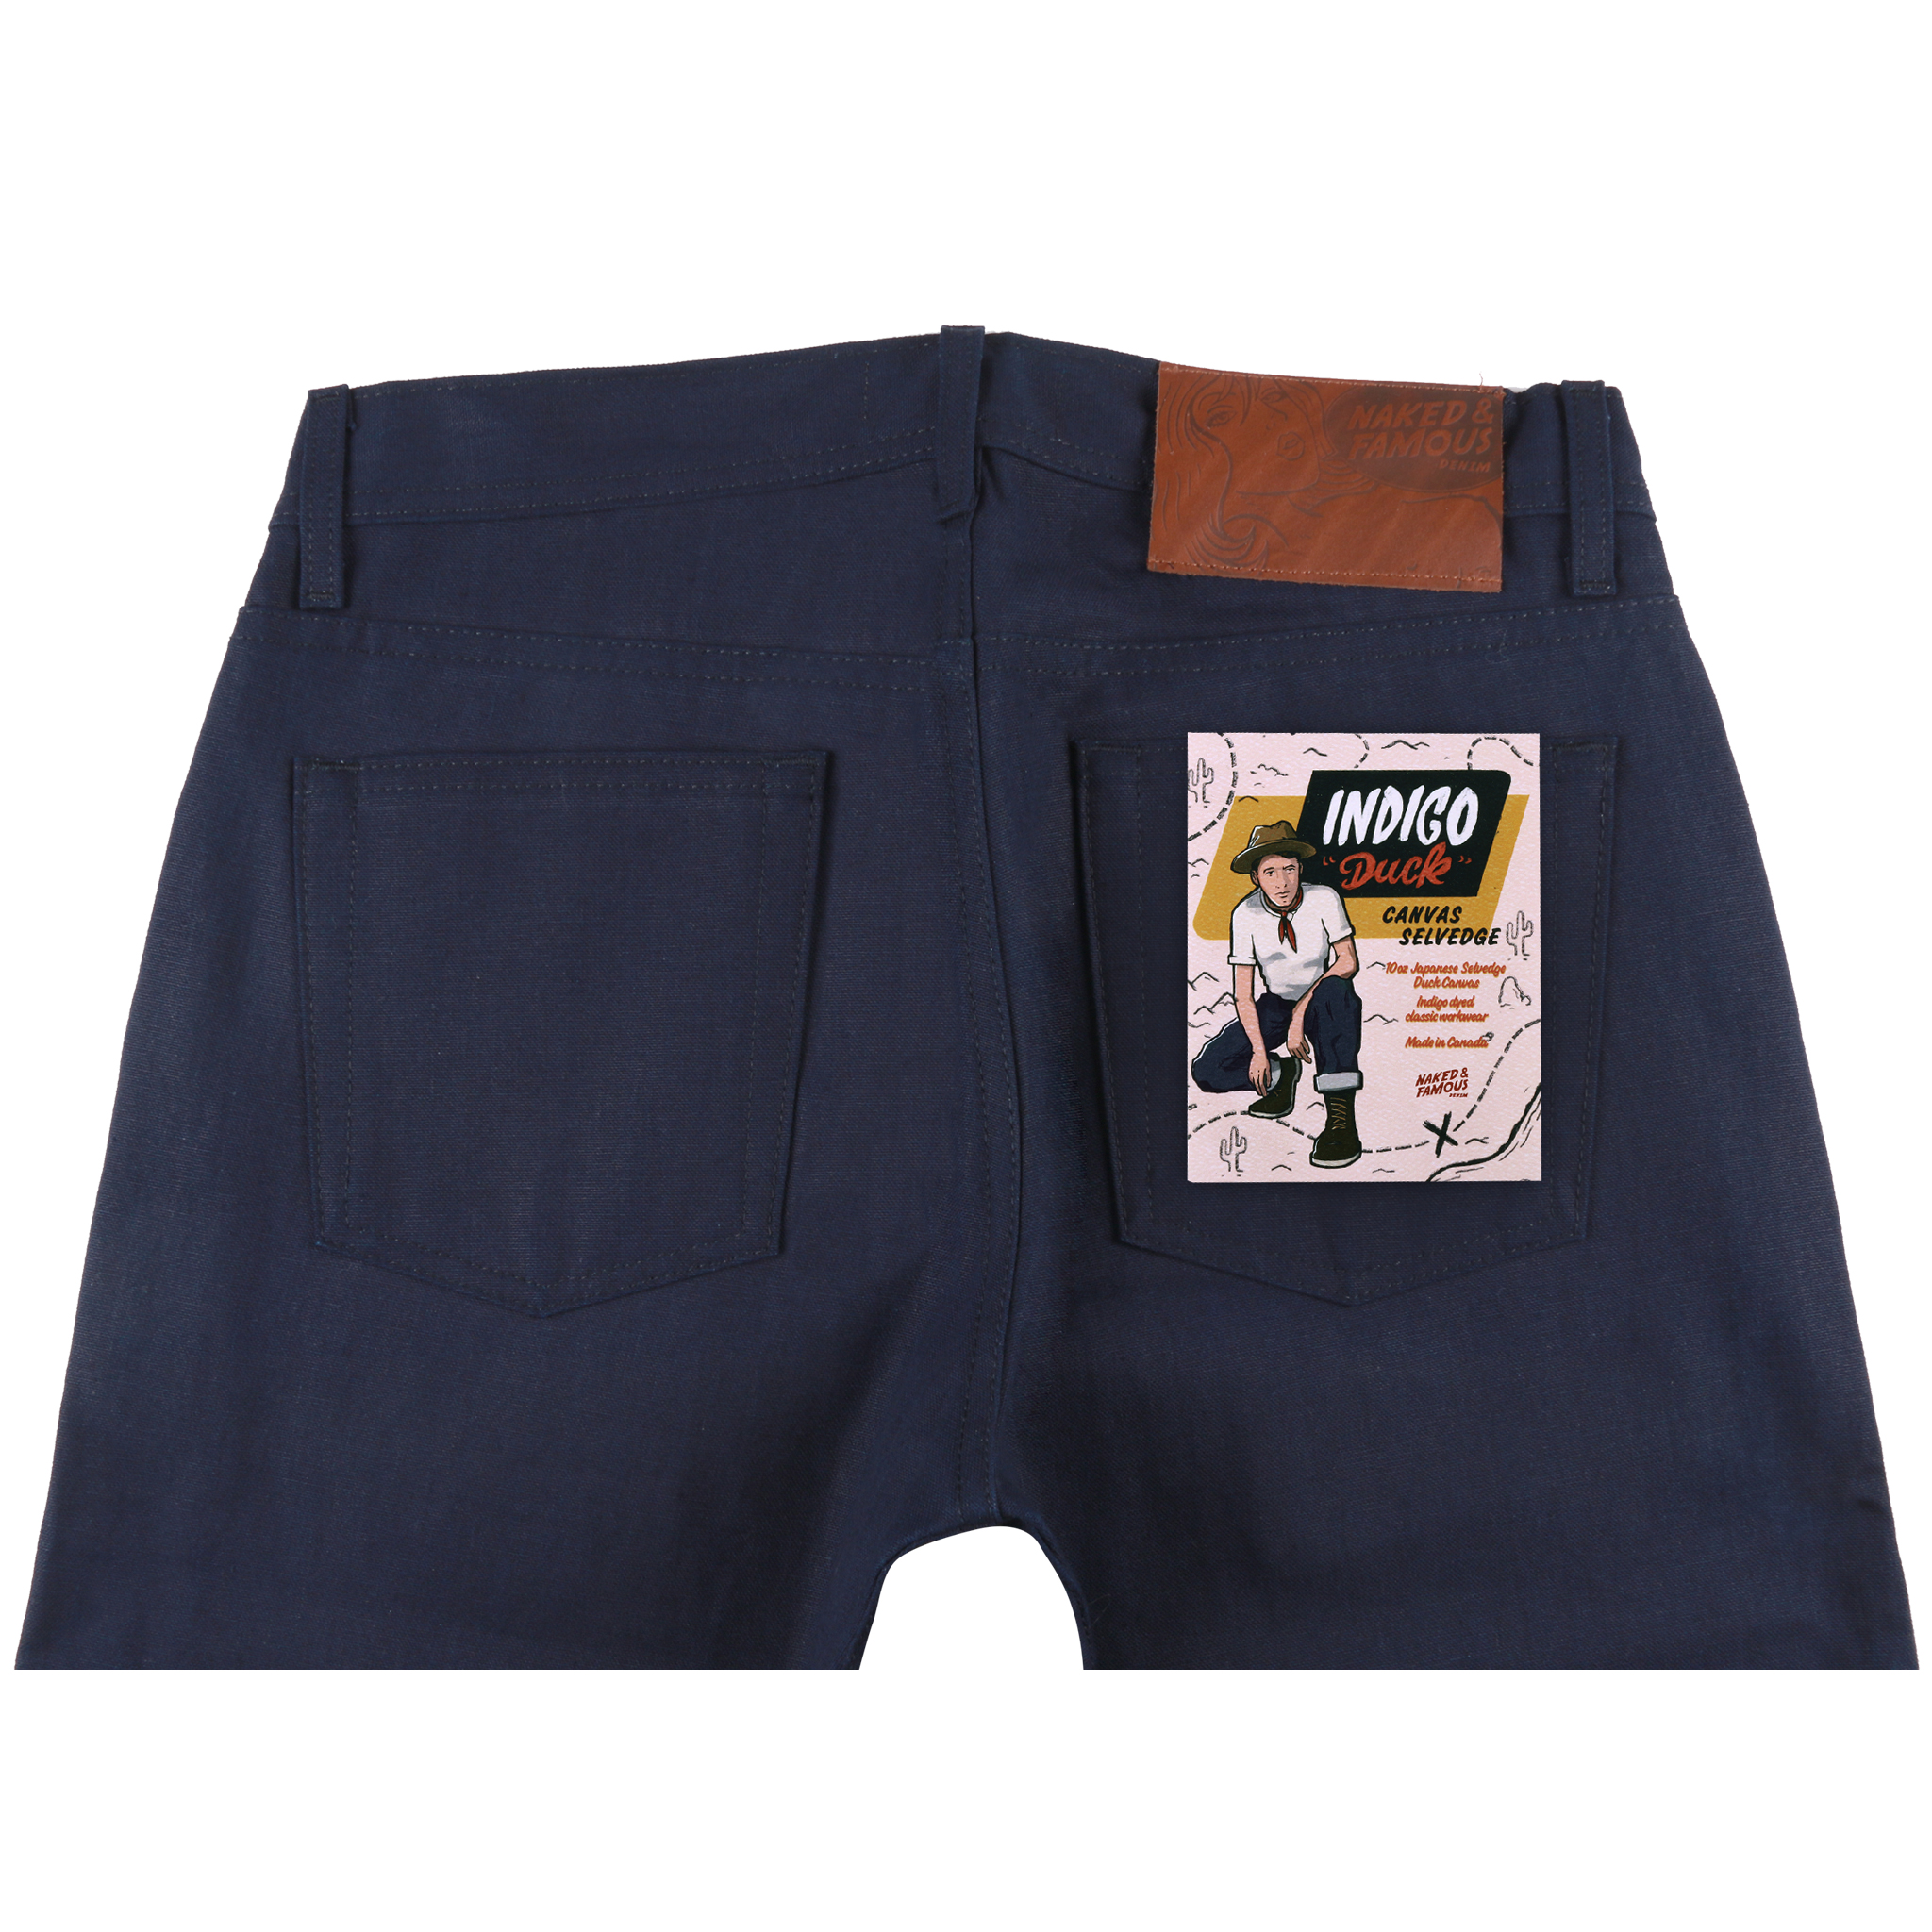 Indigo Duck Canvas Selvedge jeans back